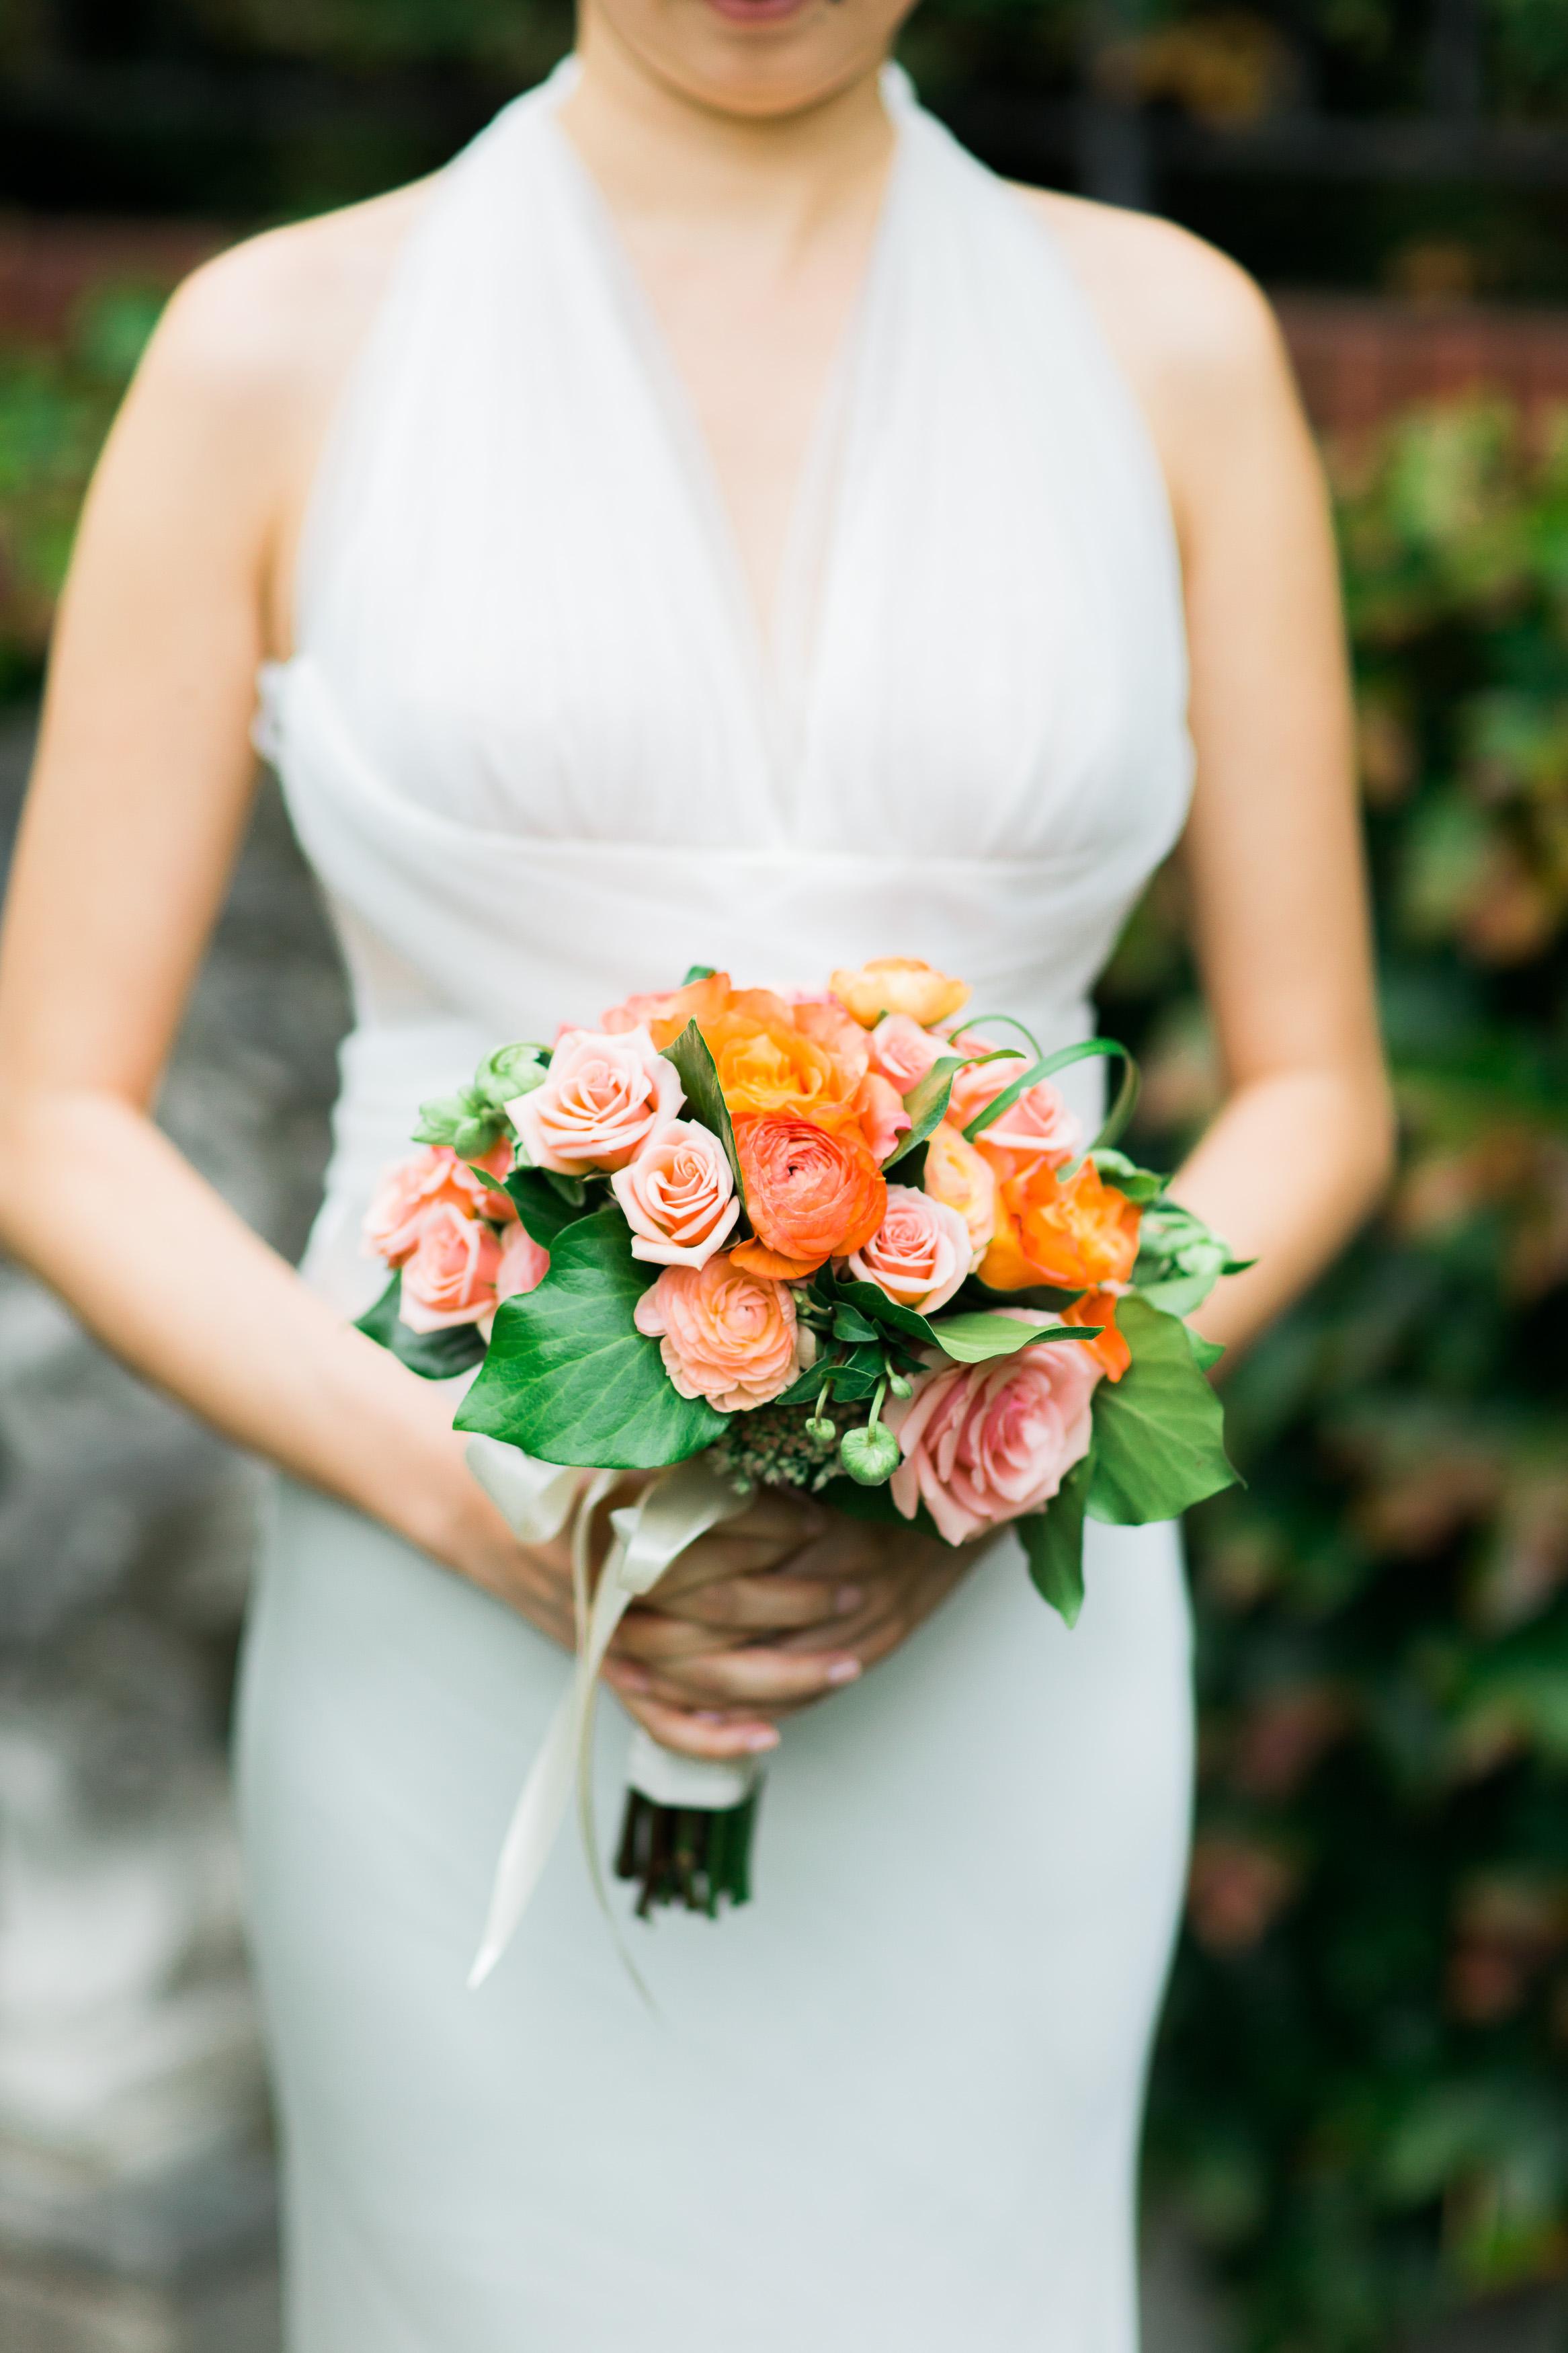 Pink and Peach Wedding Bouquet   Parsons Gardens Wedding   Asgari Photography   Chinese Wedding Planner   Seattle Wedding Planner